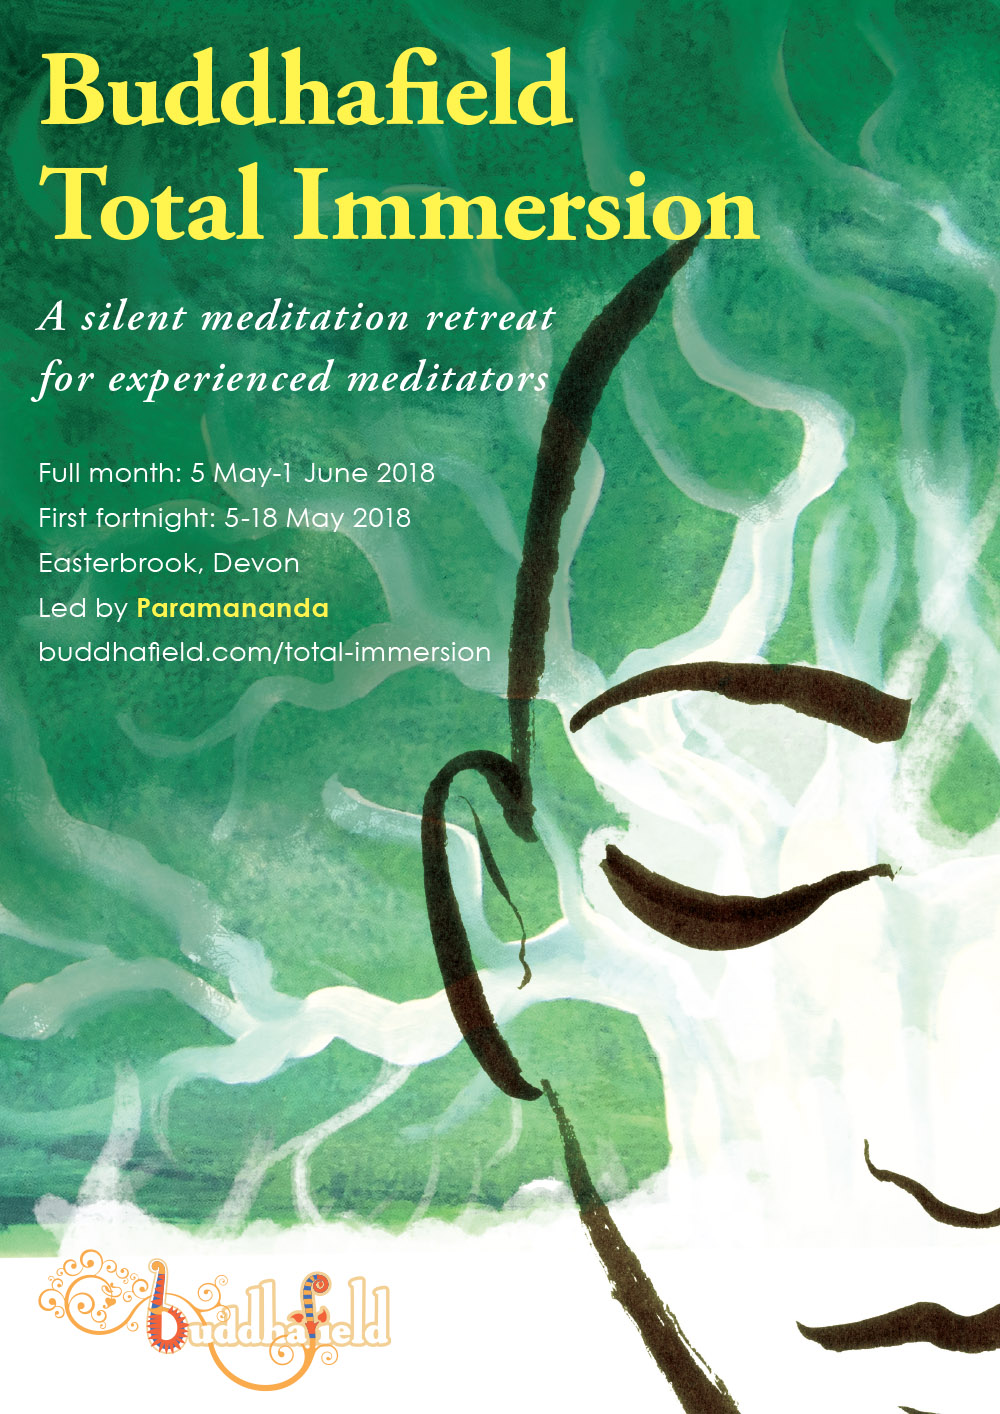 buddhafield total immersion poster illustration design